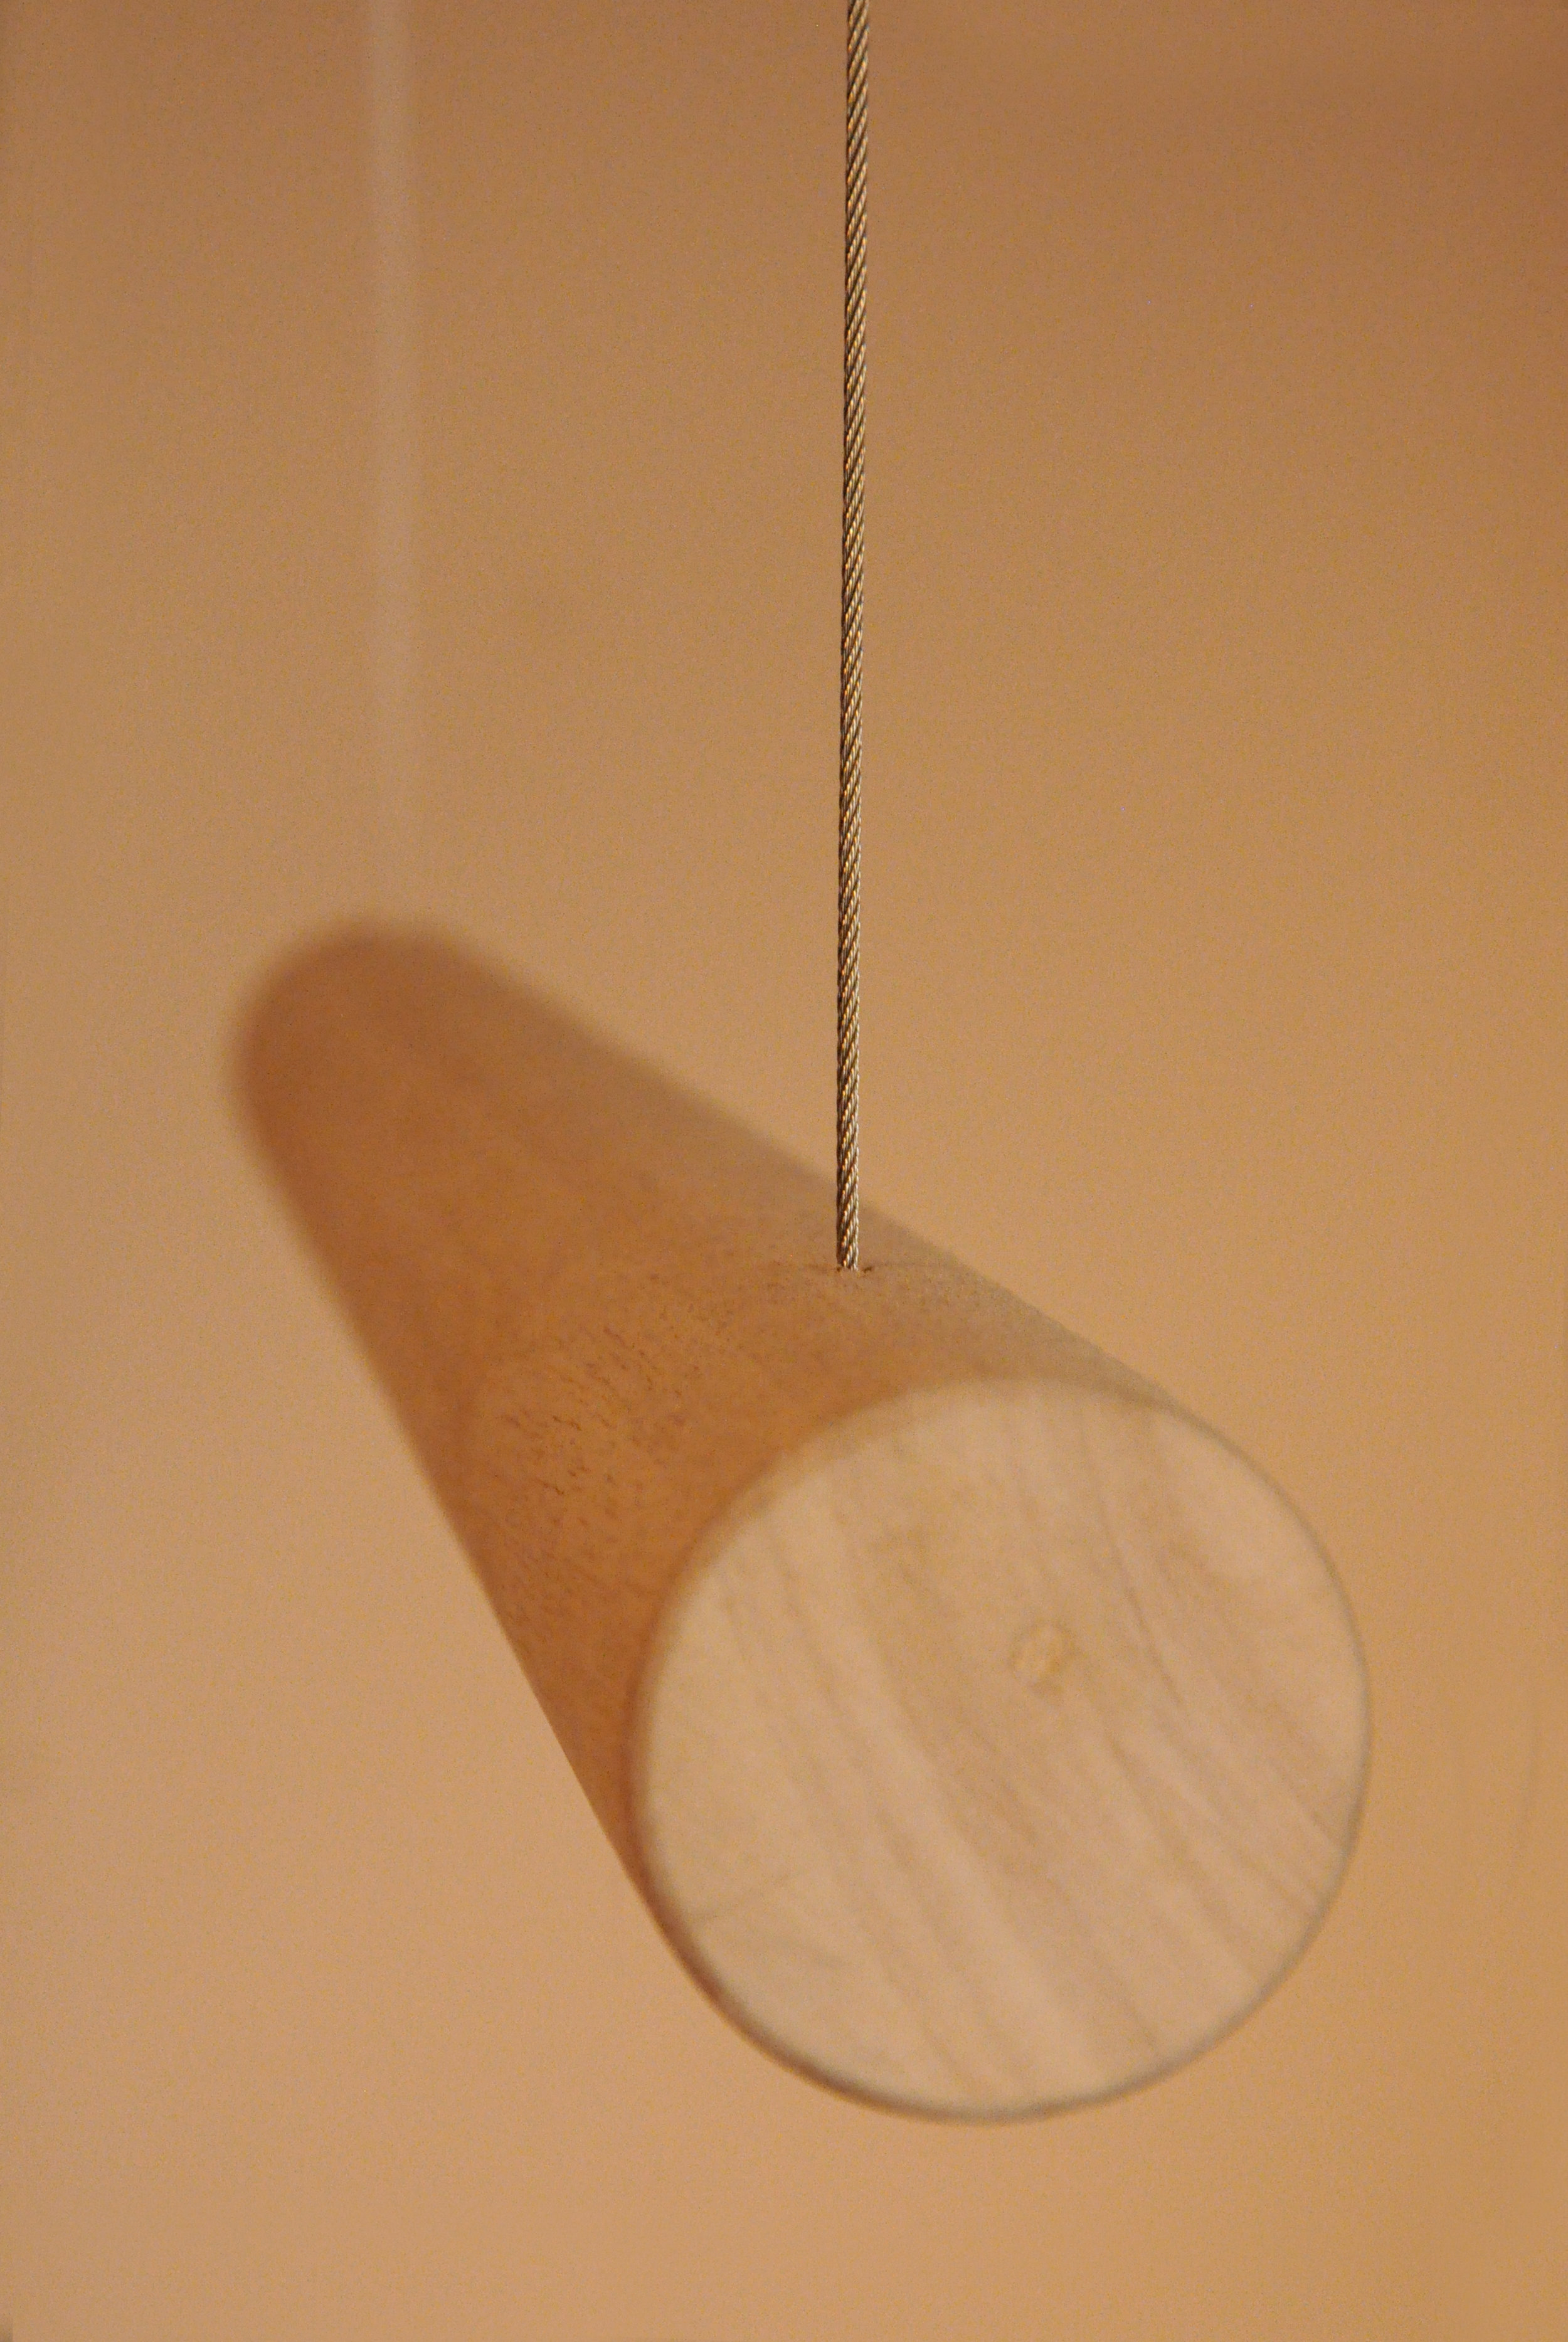 Roll - repurposed kitchenware